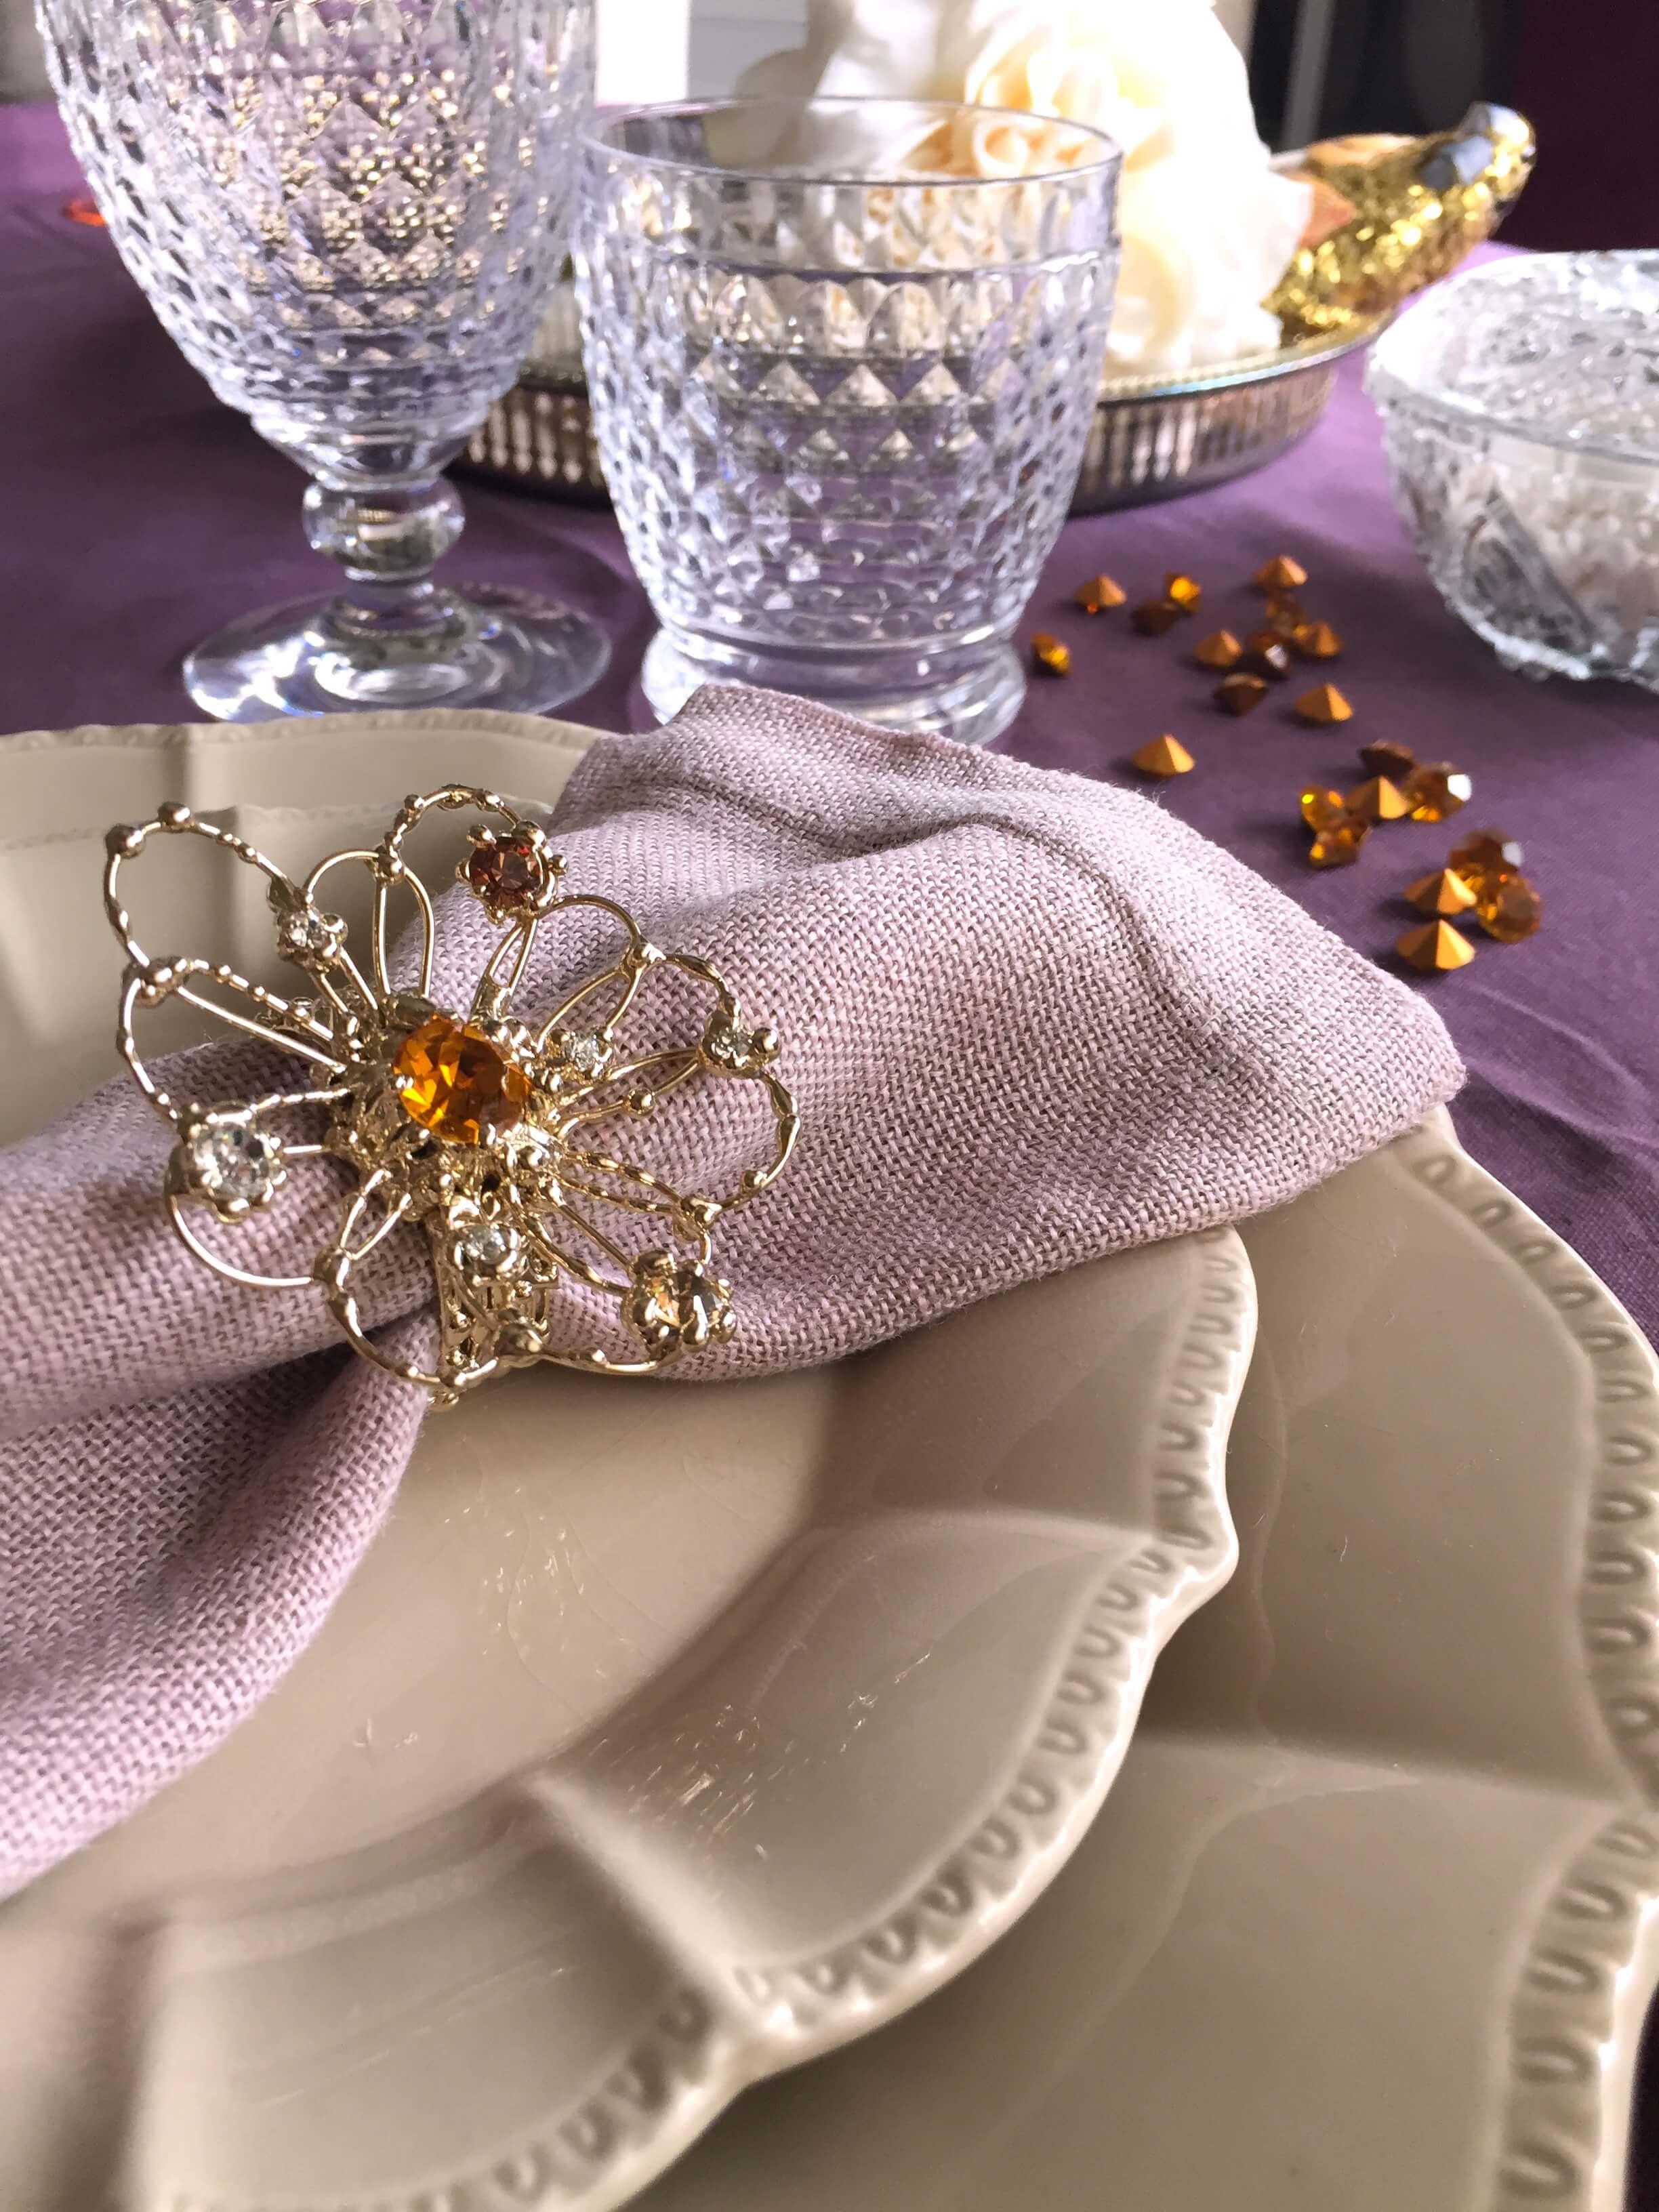 6 Luxury 24 kt gold finish Swarovski flowers napkin rings